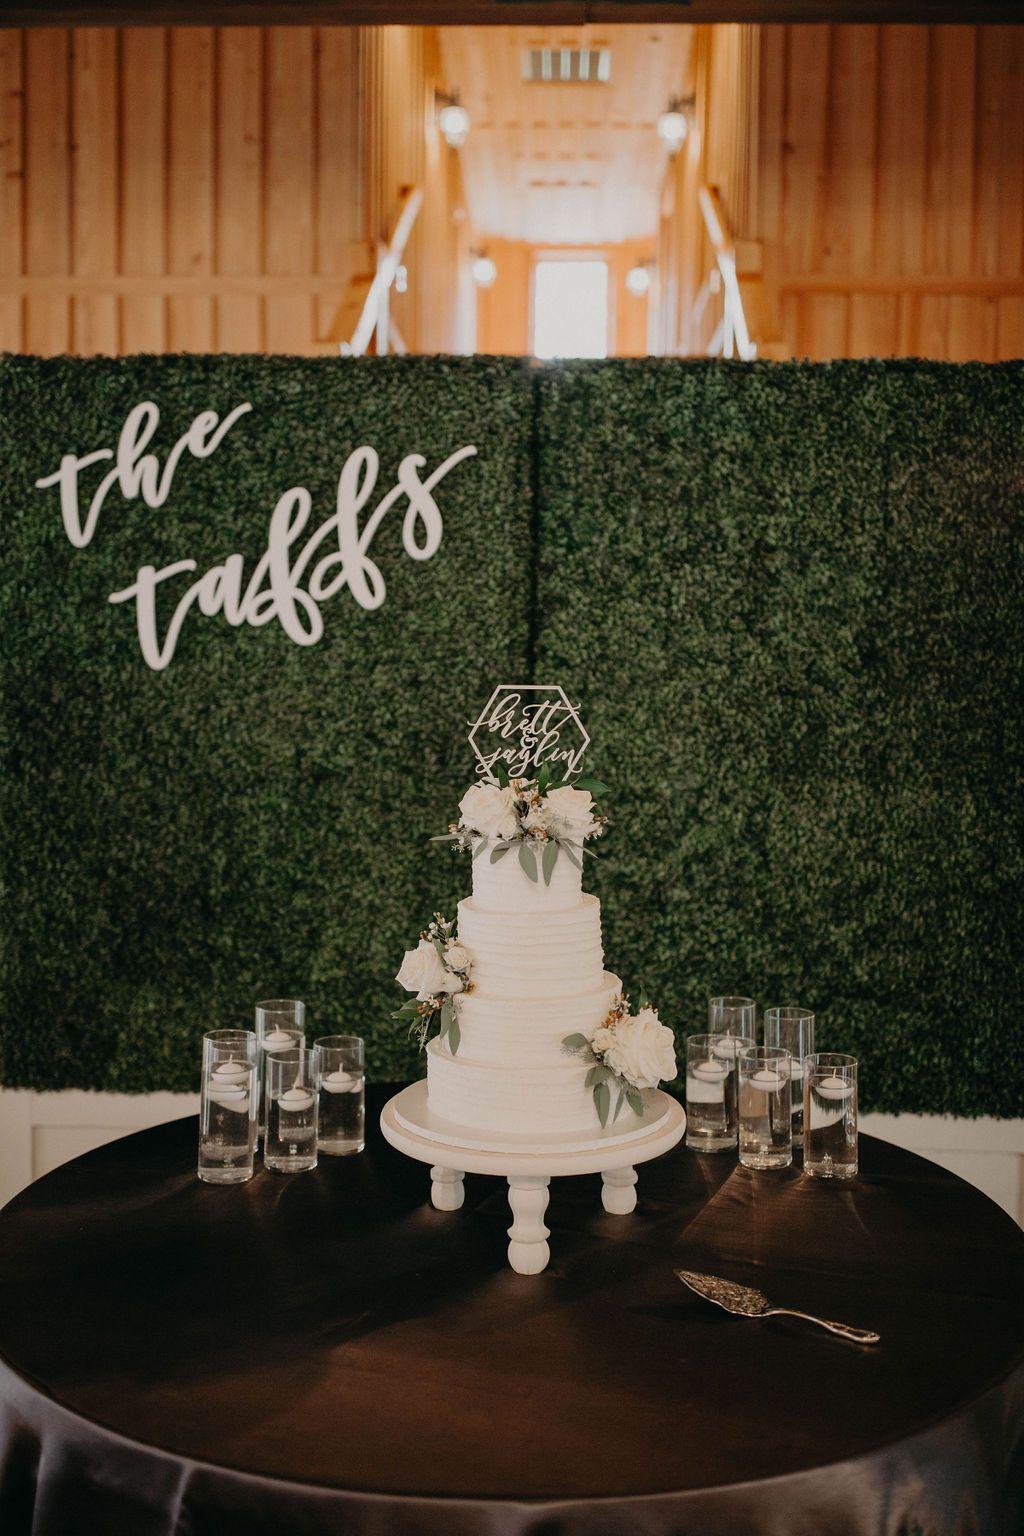 Bohemian Wedding Cake Table Decor Bohemian Wedding Reception Cake Table Deco Wedding Cake Table Decorations Wedding Reception Cake Table Wedding Cake Table